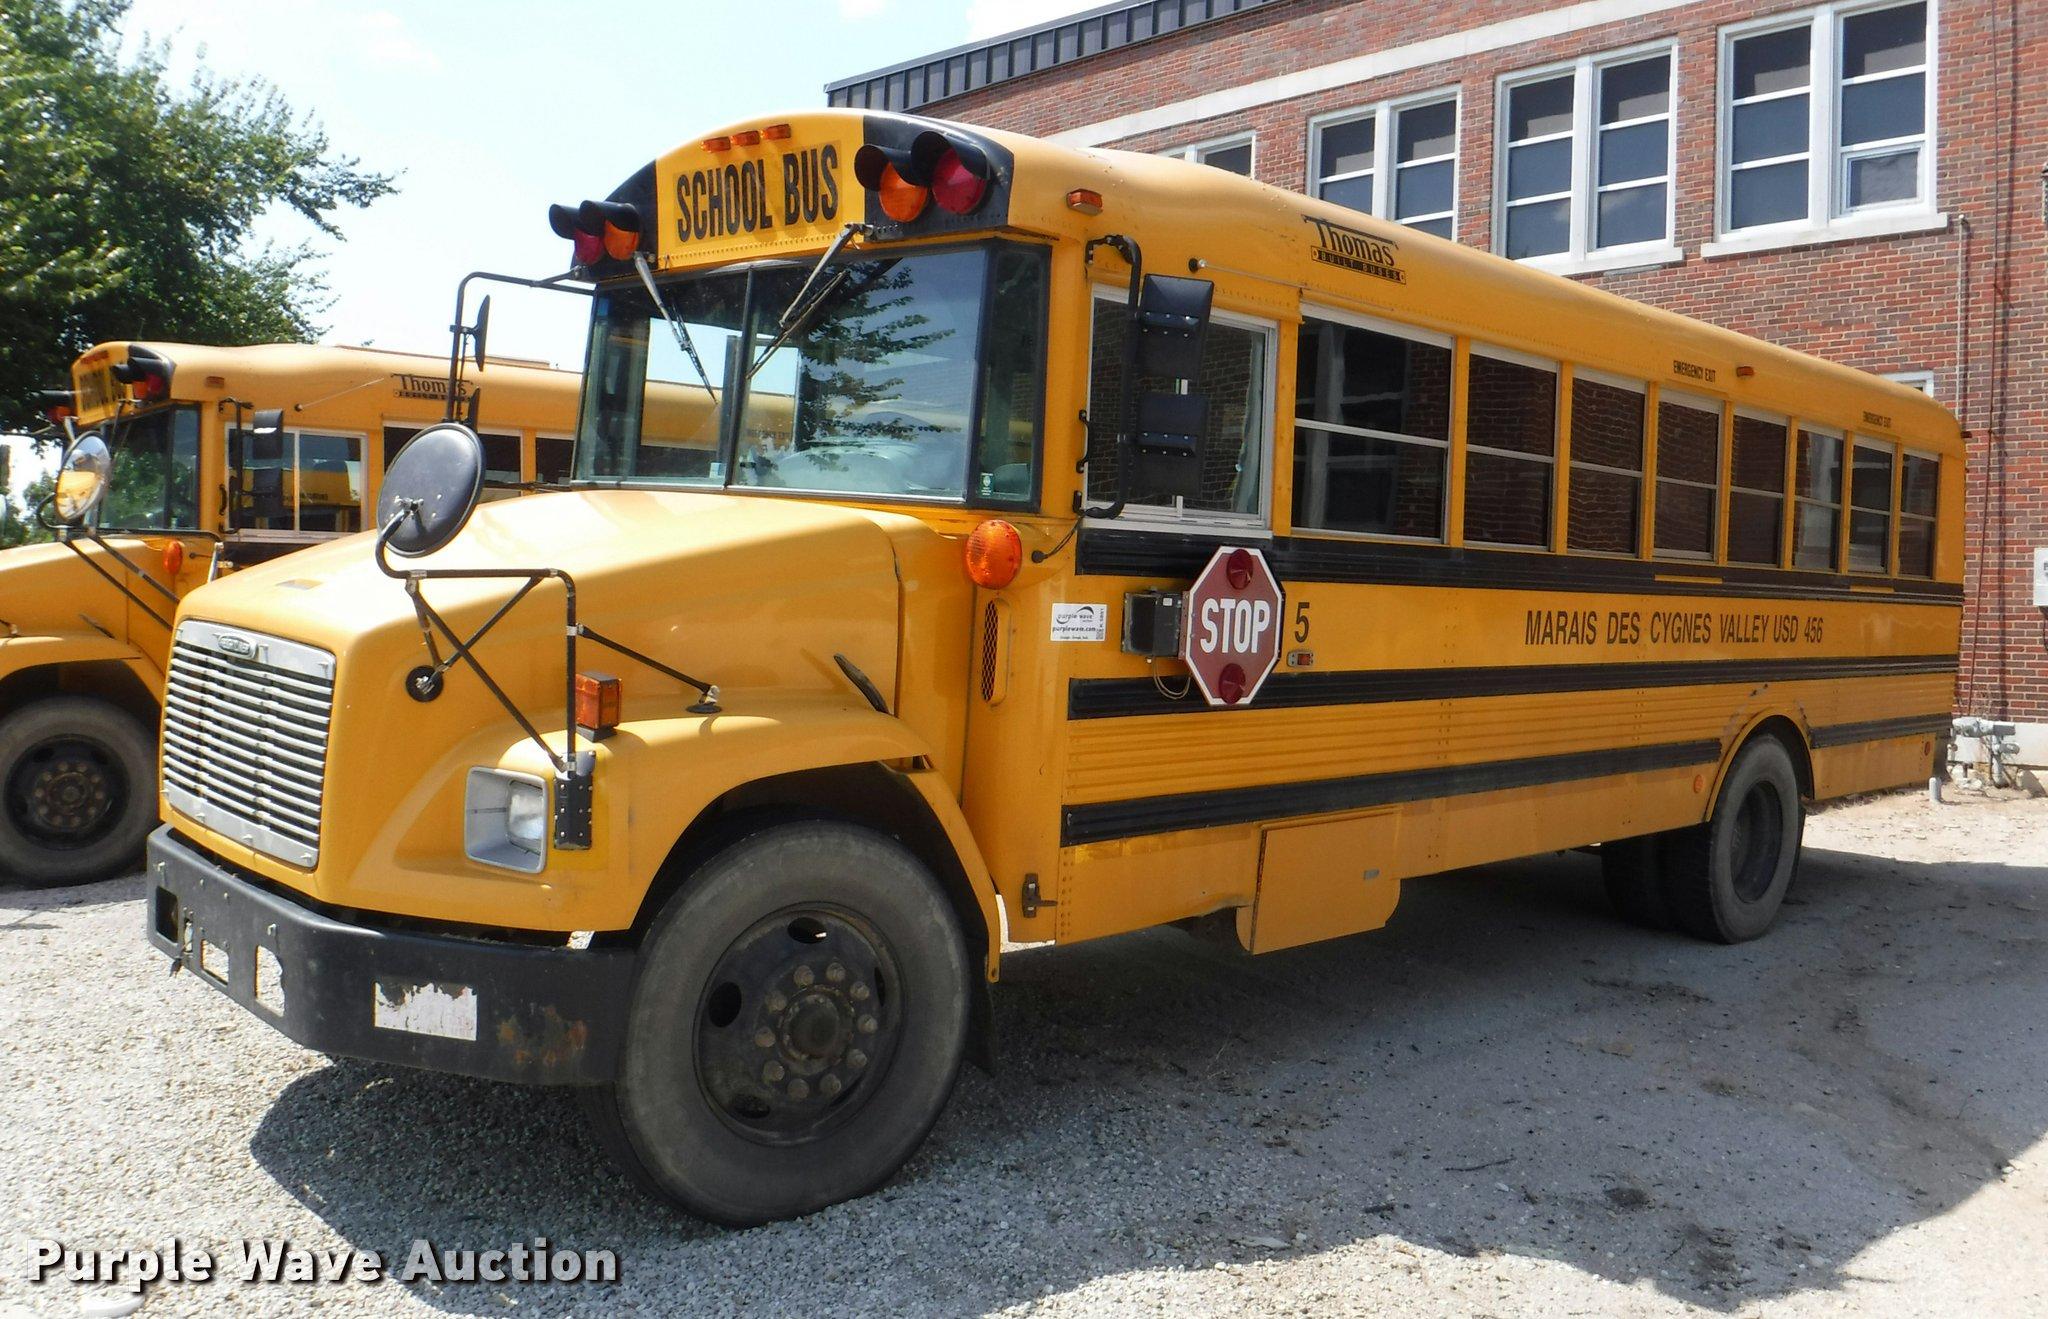 2002 Freightliner Fs65 Thomas School Bus Item K5891 Sold. Full Size In New Window. Freightliner. Freightliner Fs65 Heater Wiring At Scoala.co